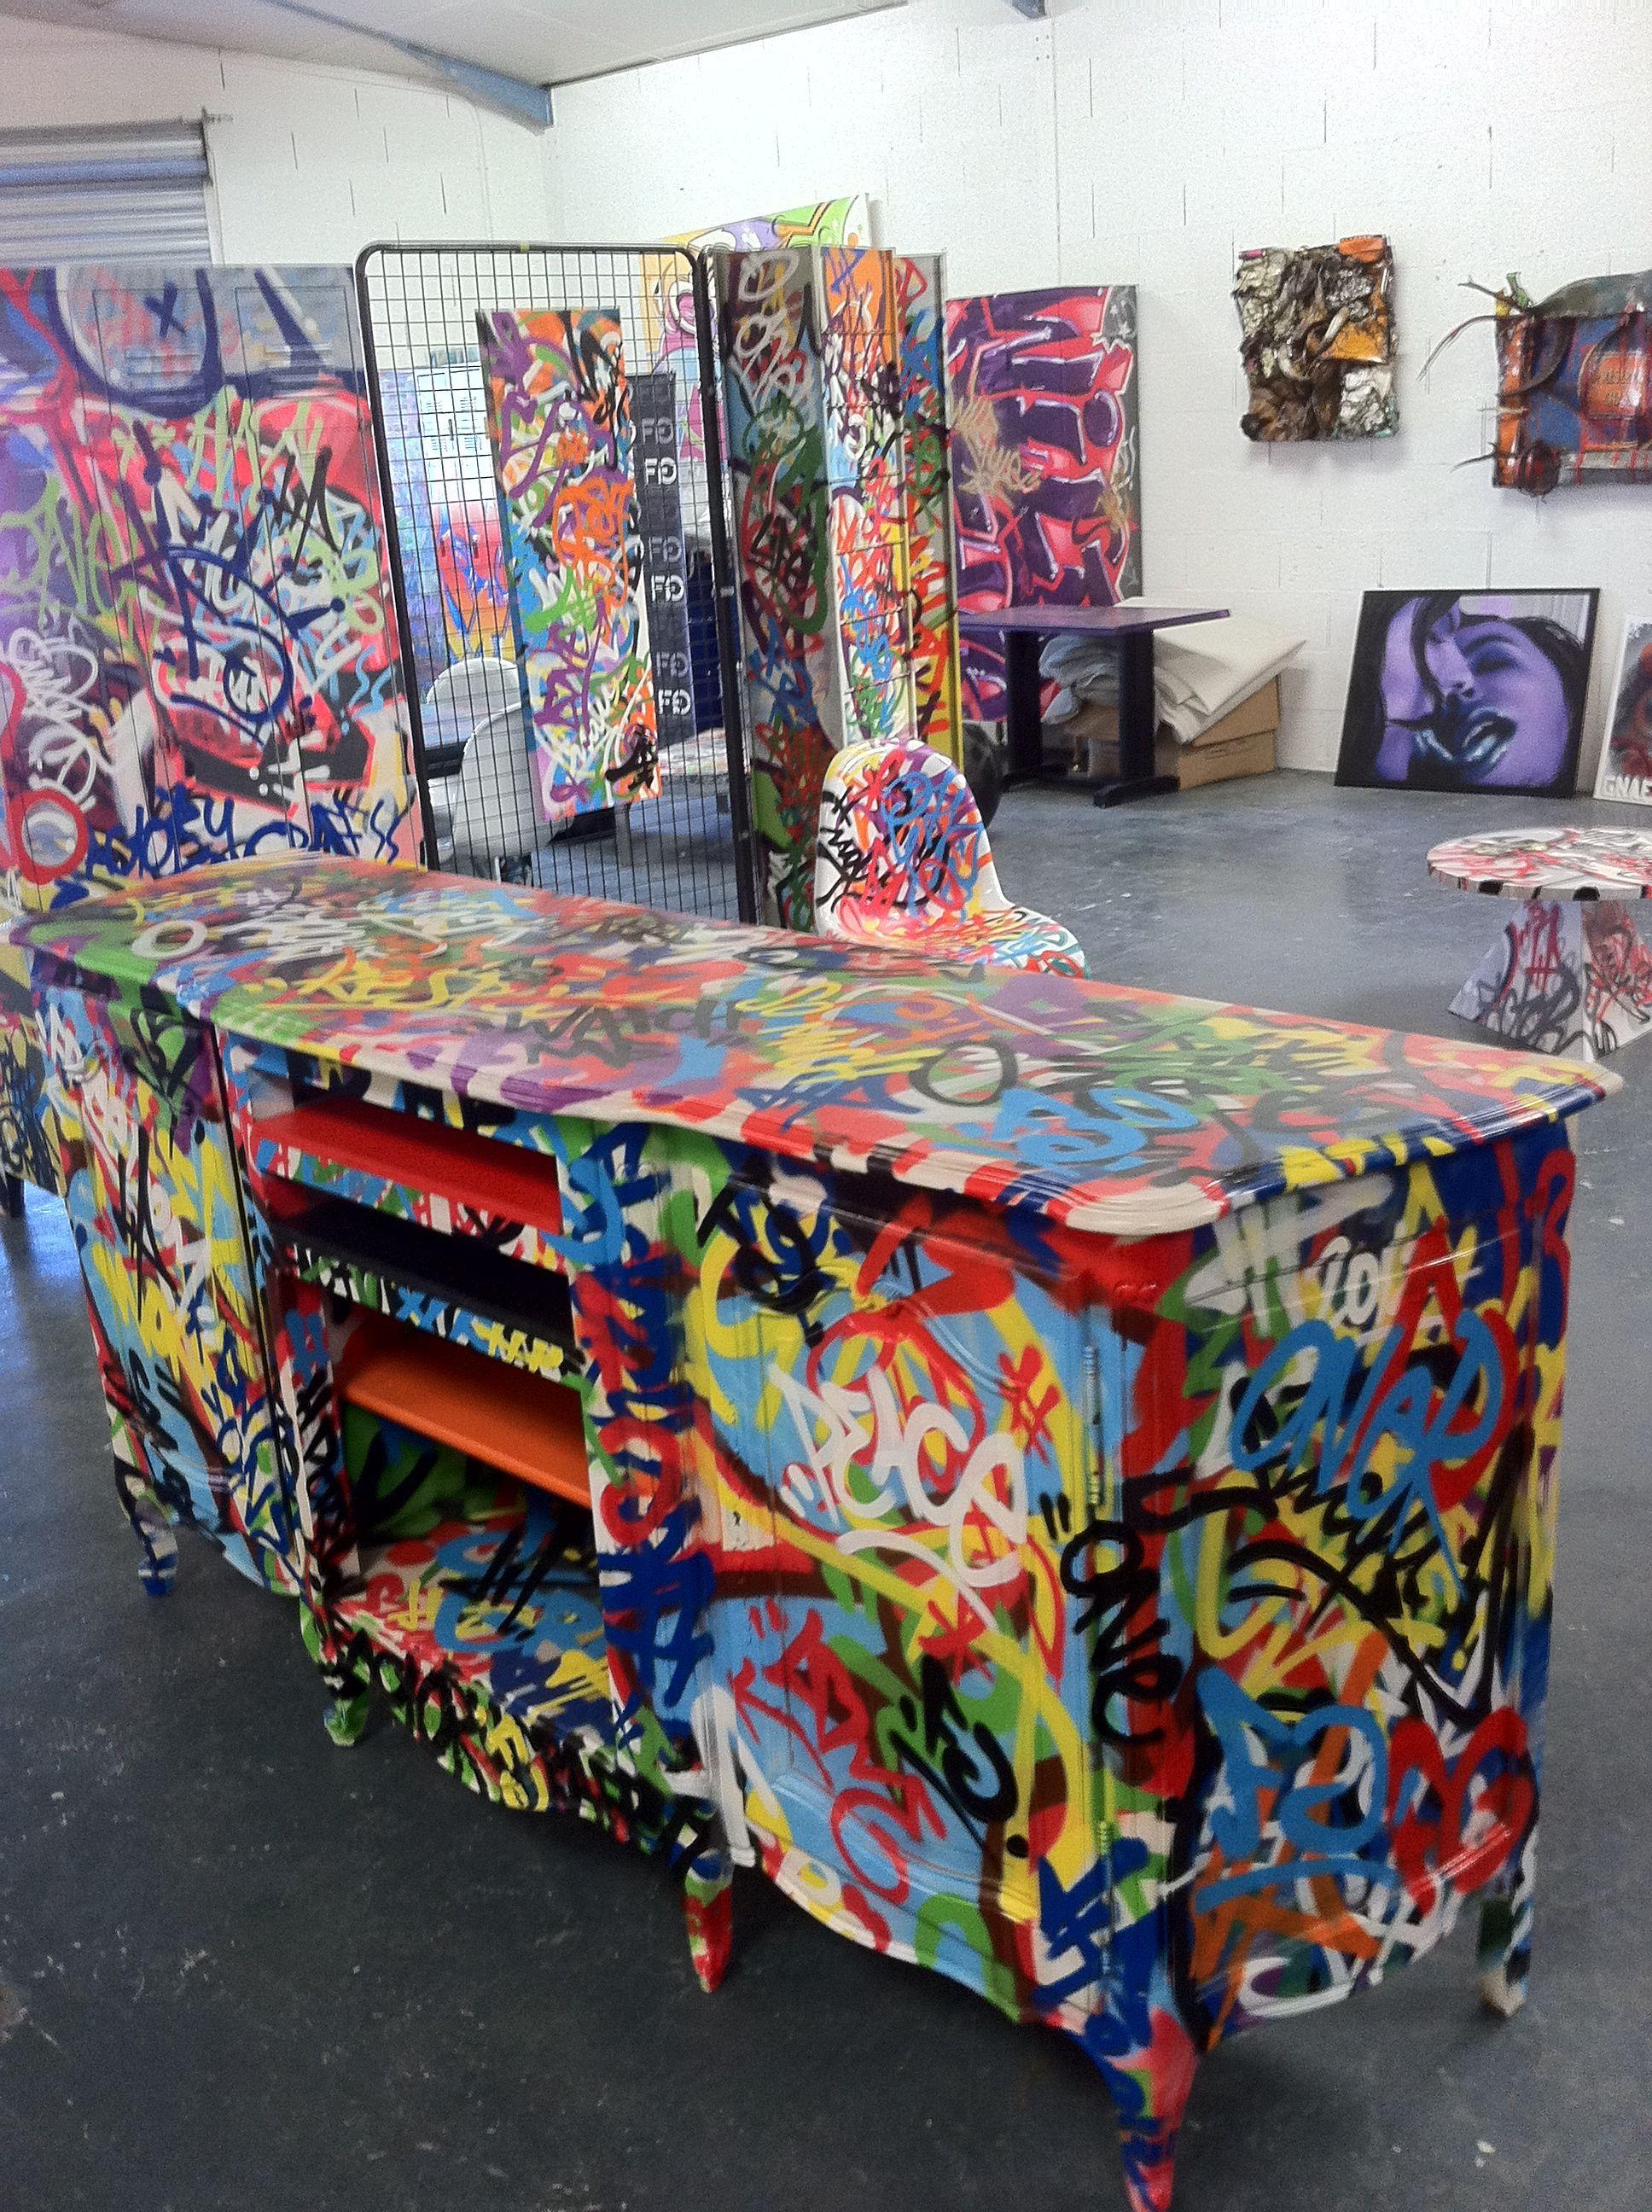 Graffiti art diy - Best 25 Graffiti Bedroom Ideas On Pinterest Graffiti Room Where Is Wall Street And The Room